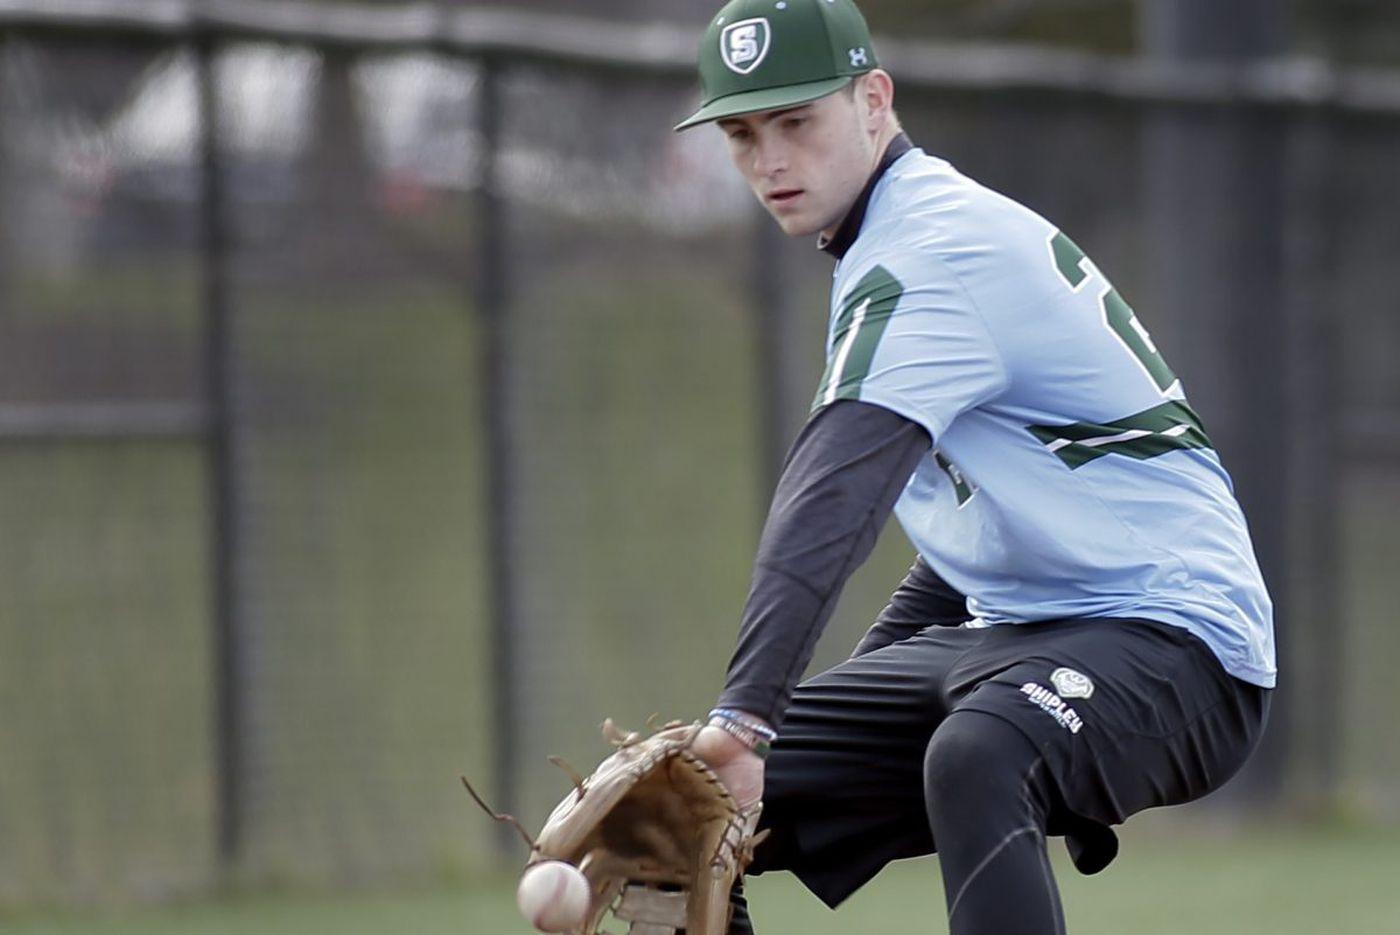 Tuesday's Pa. roundup: Shipley baseball blanks Abington Friends